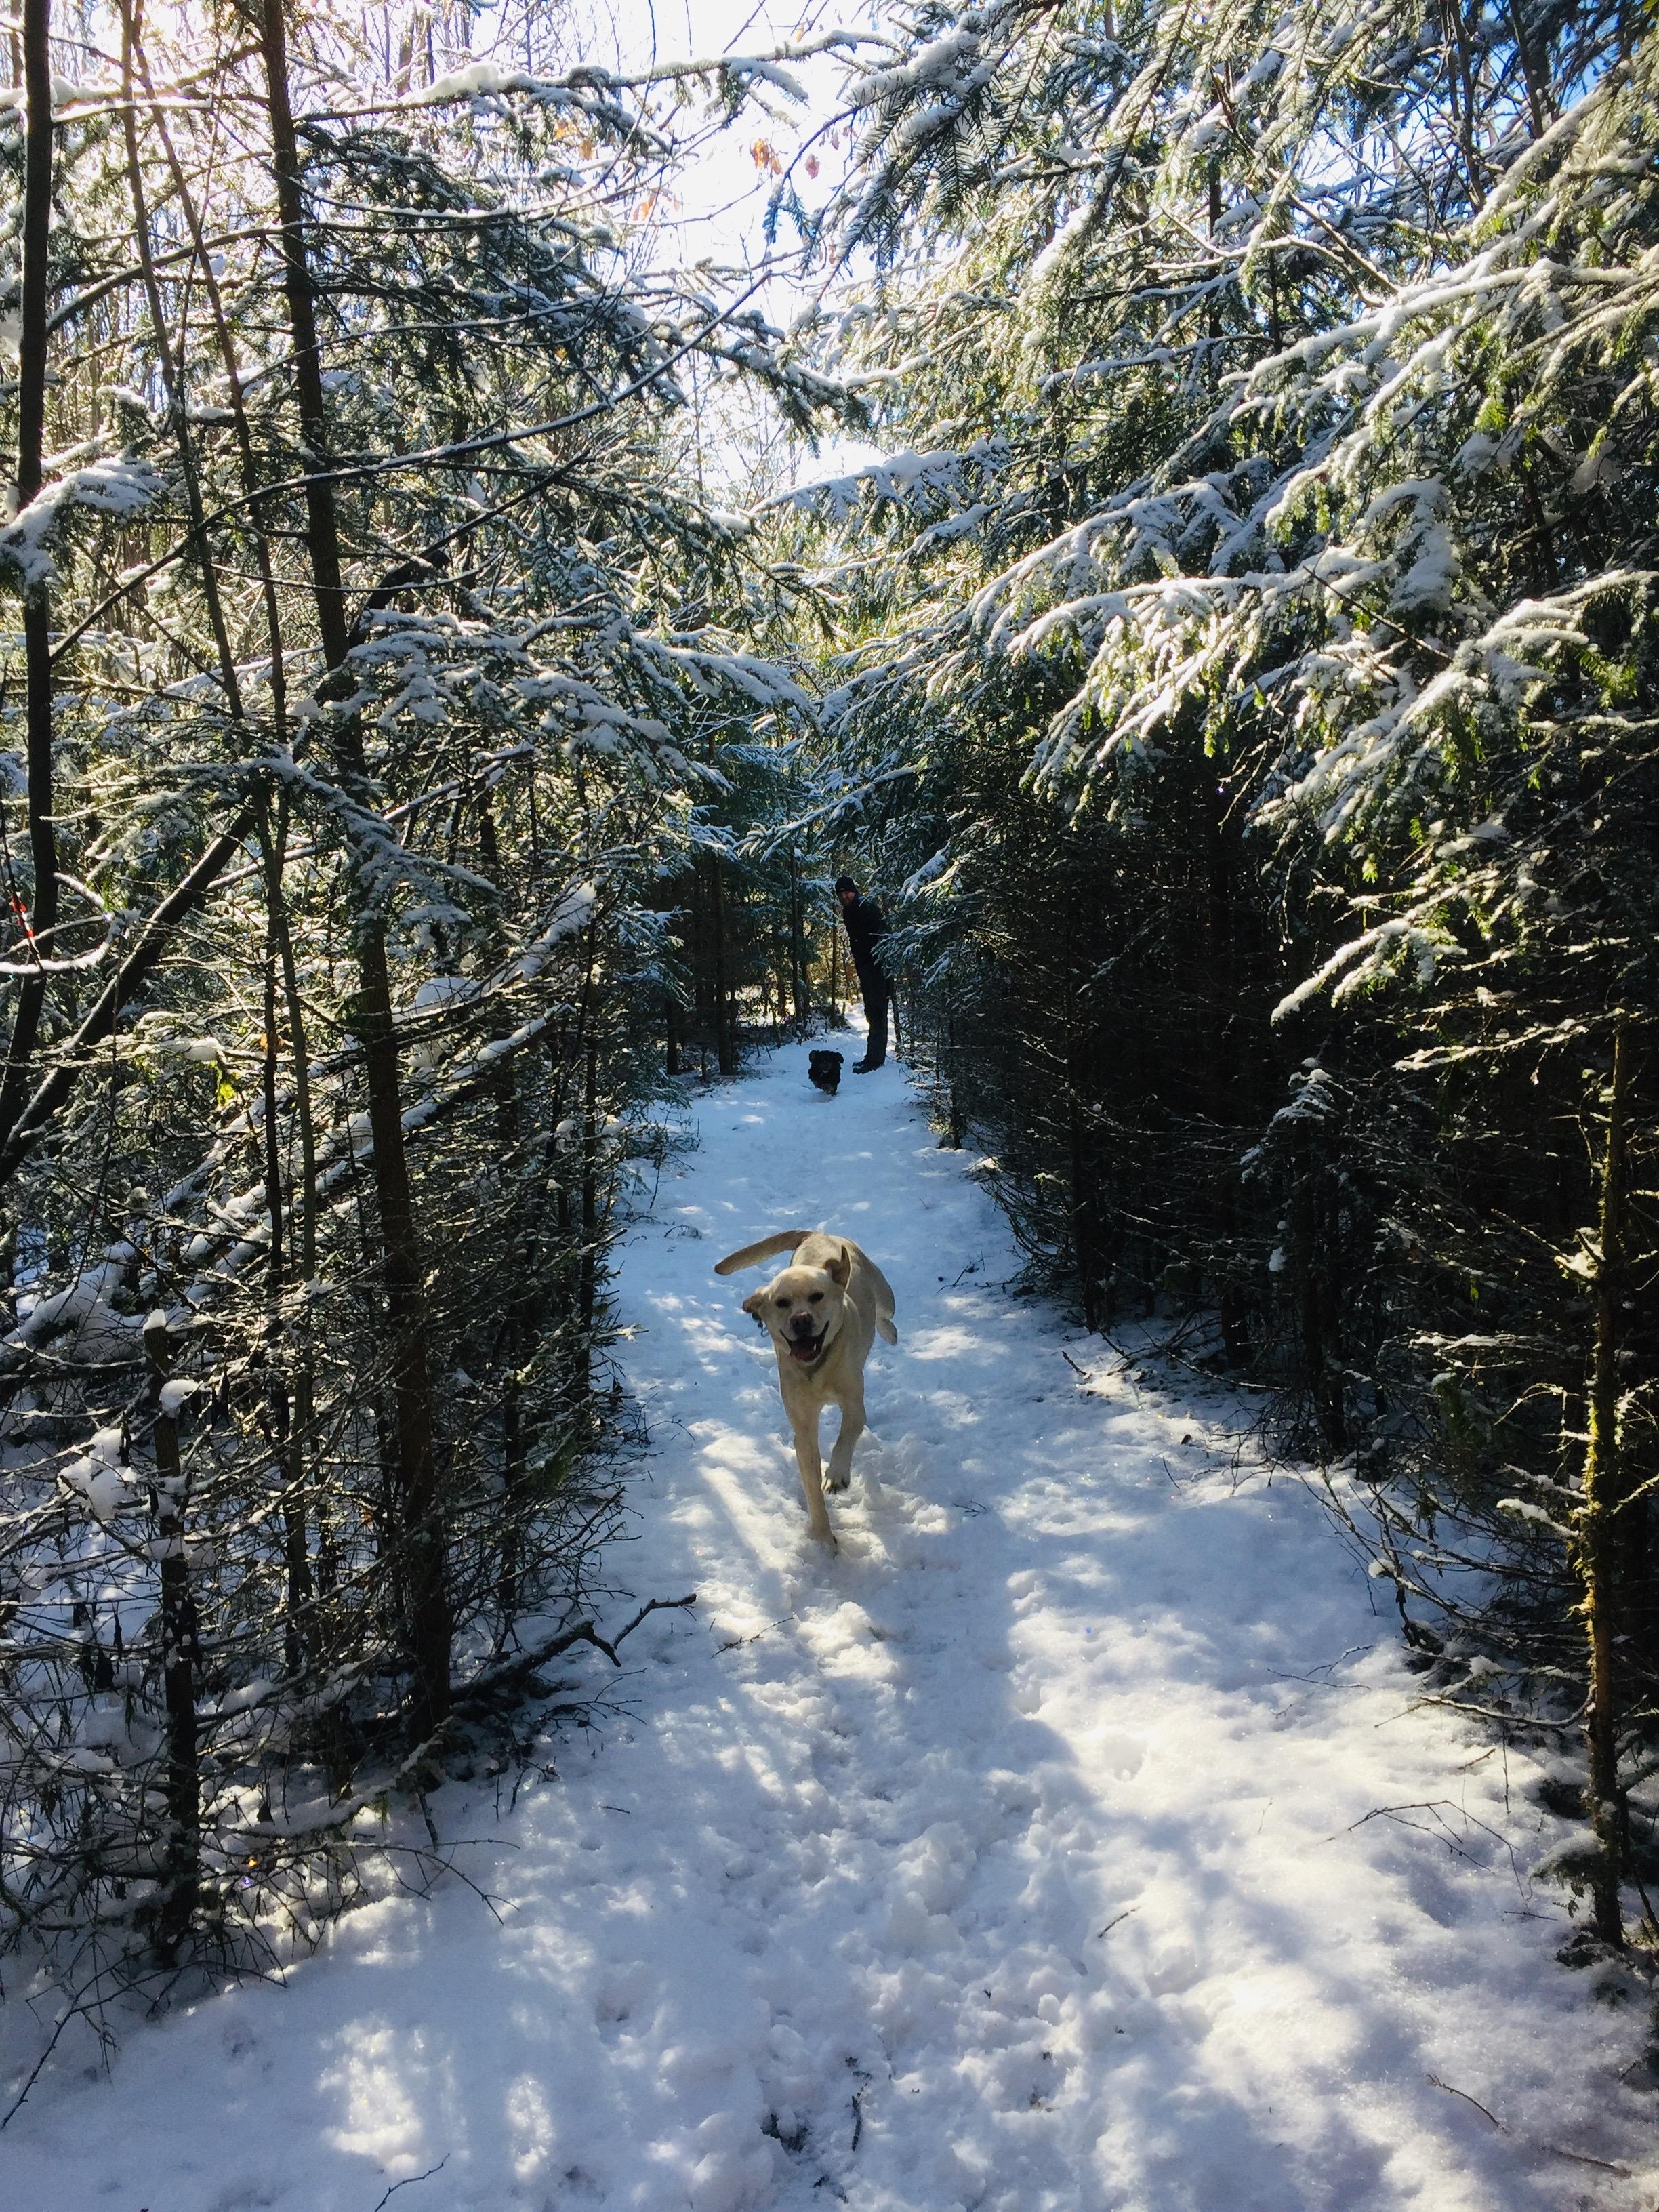 Vinter in Norge